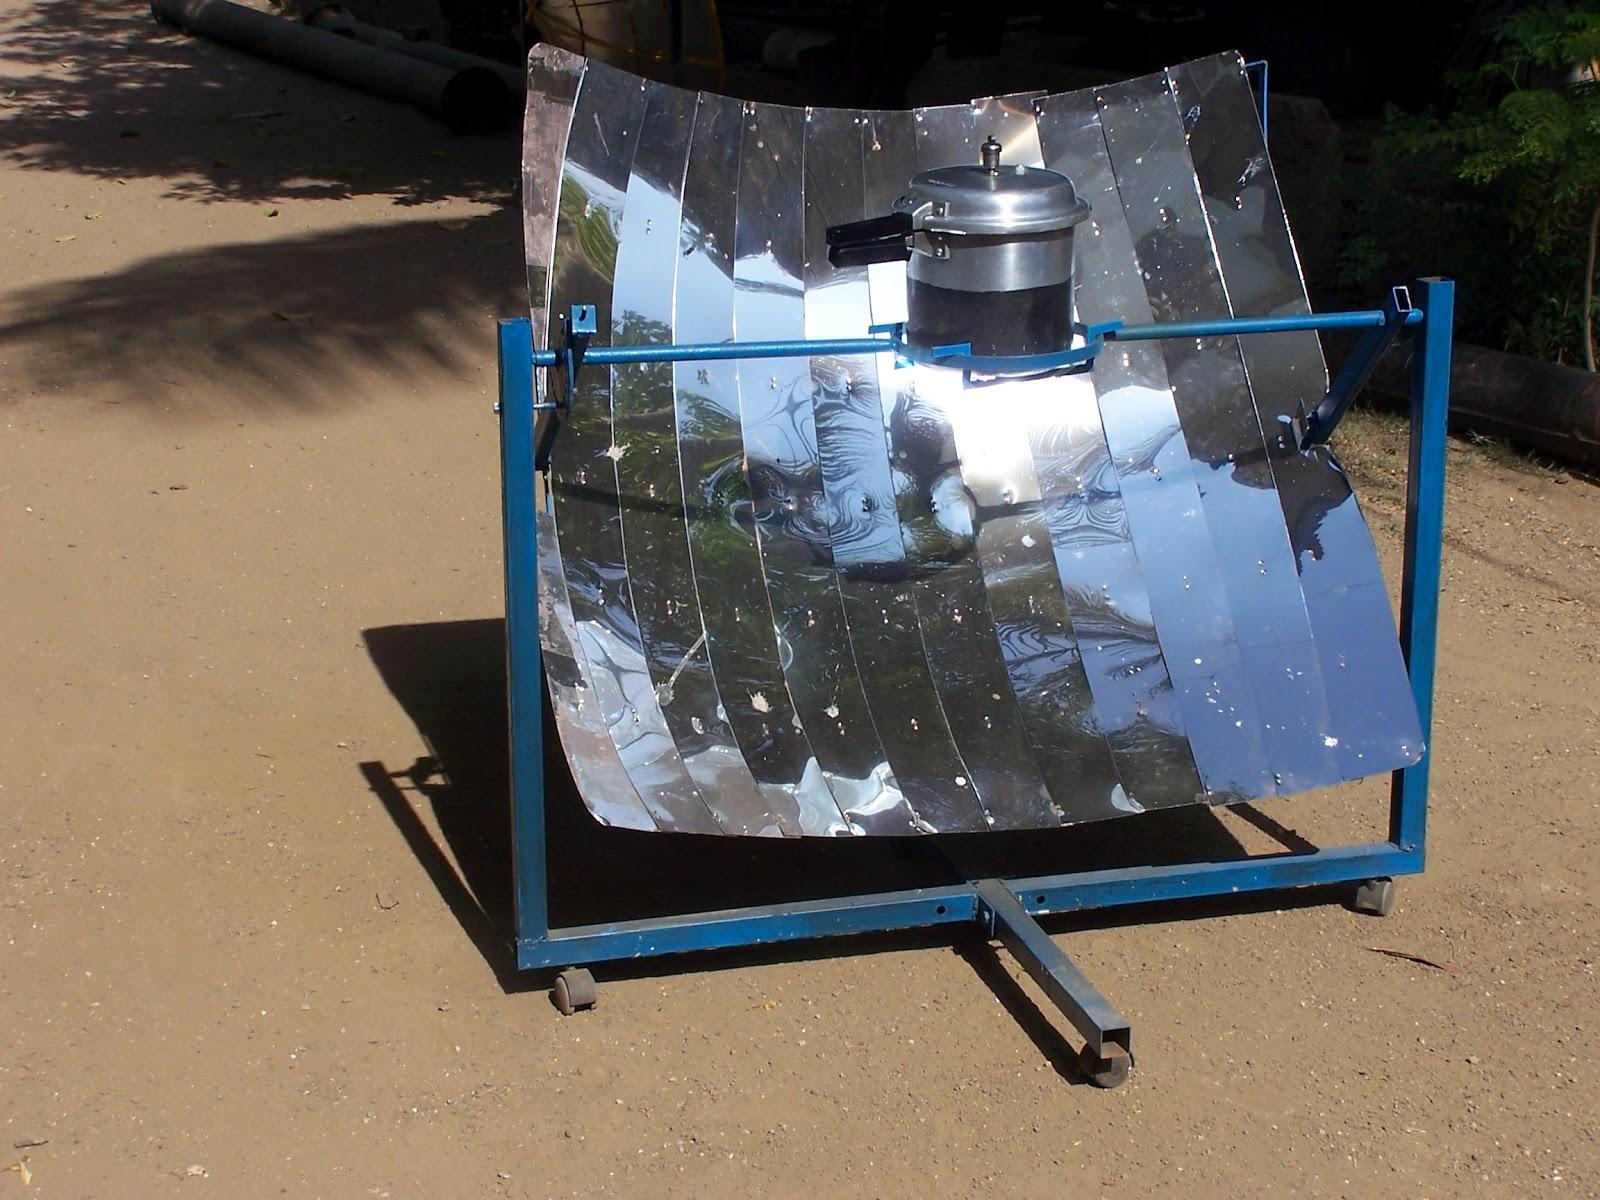 Solar Cooker Designs Parabolic Concentrators